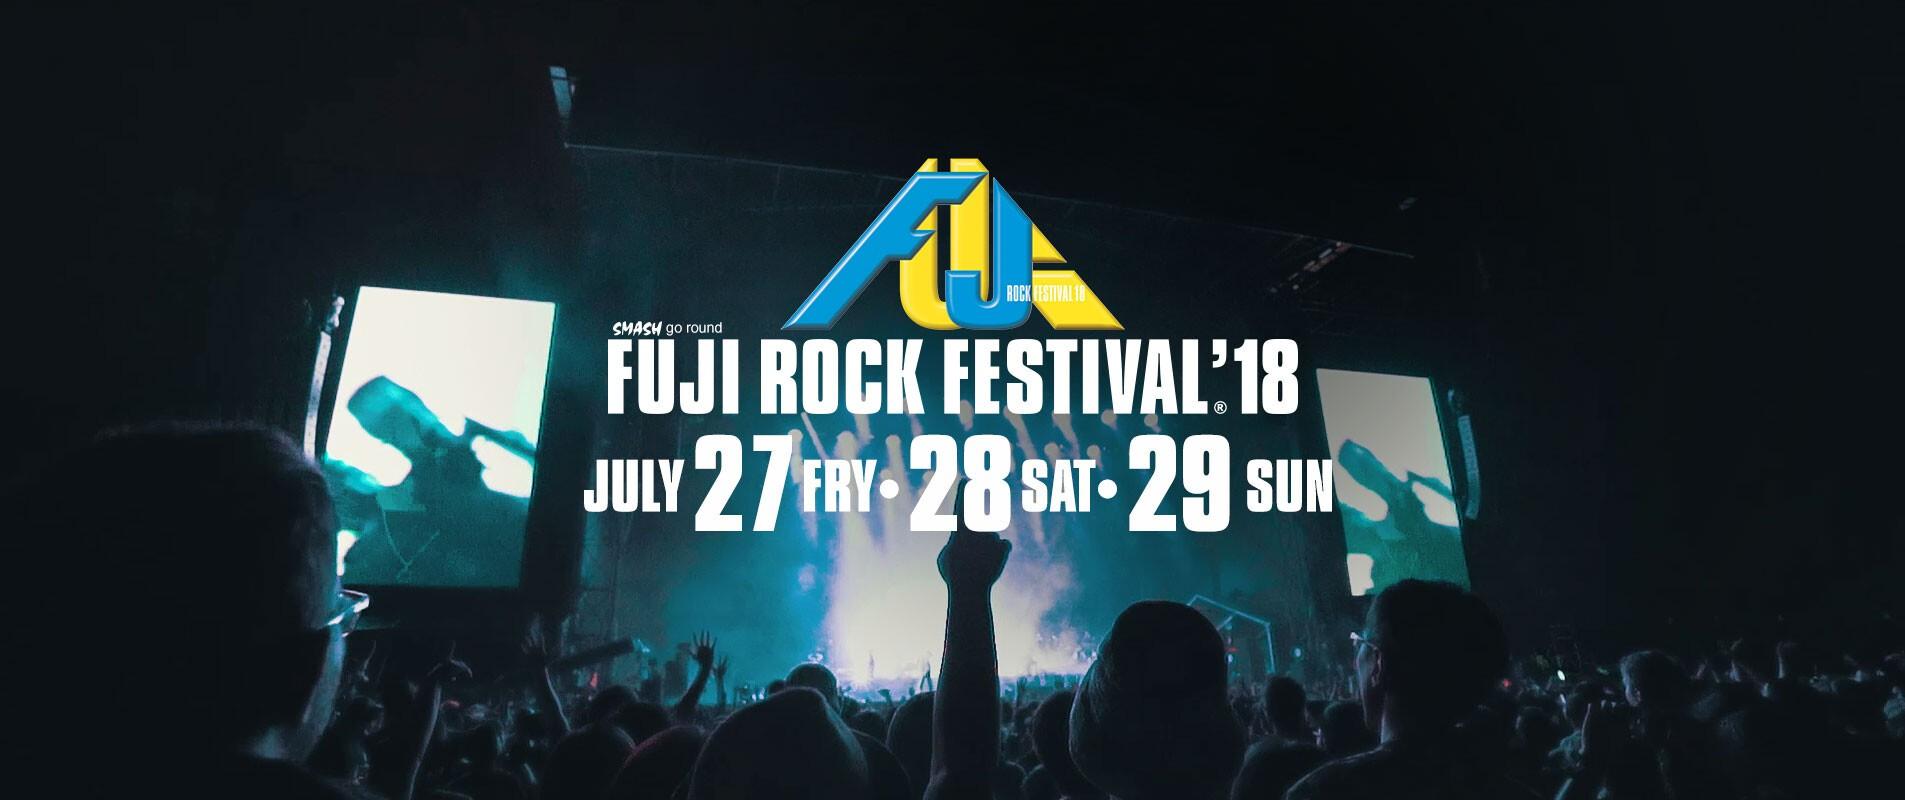 FUJI ROCK FESTIVAL JAPAN 2018